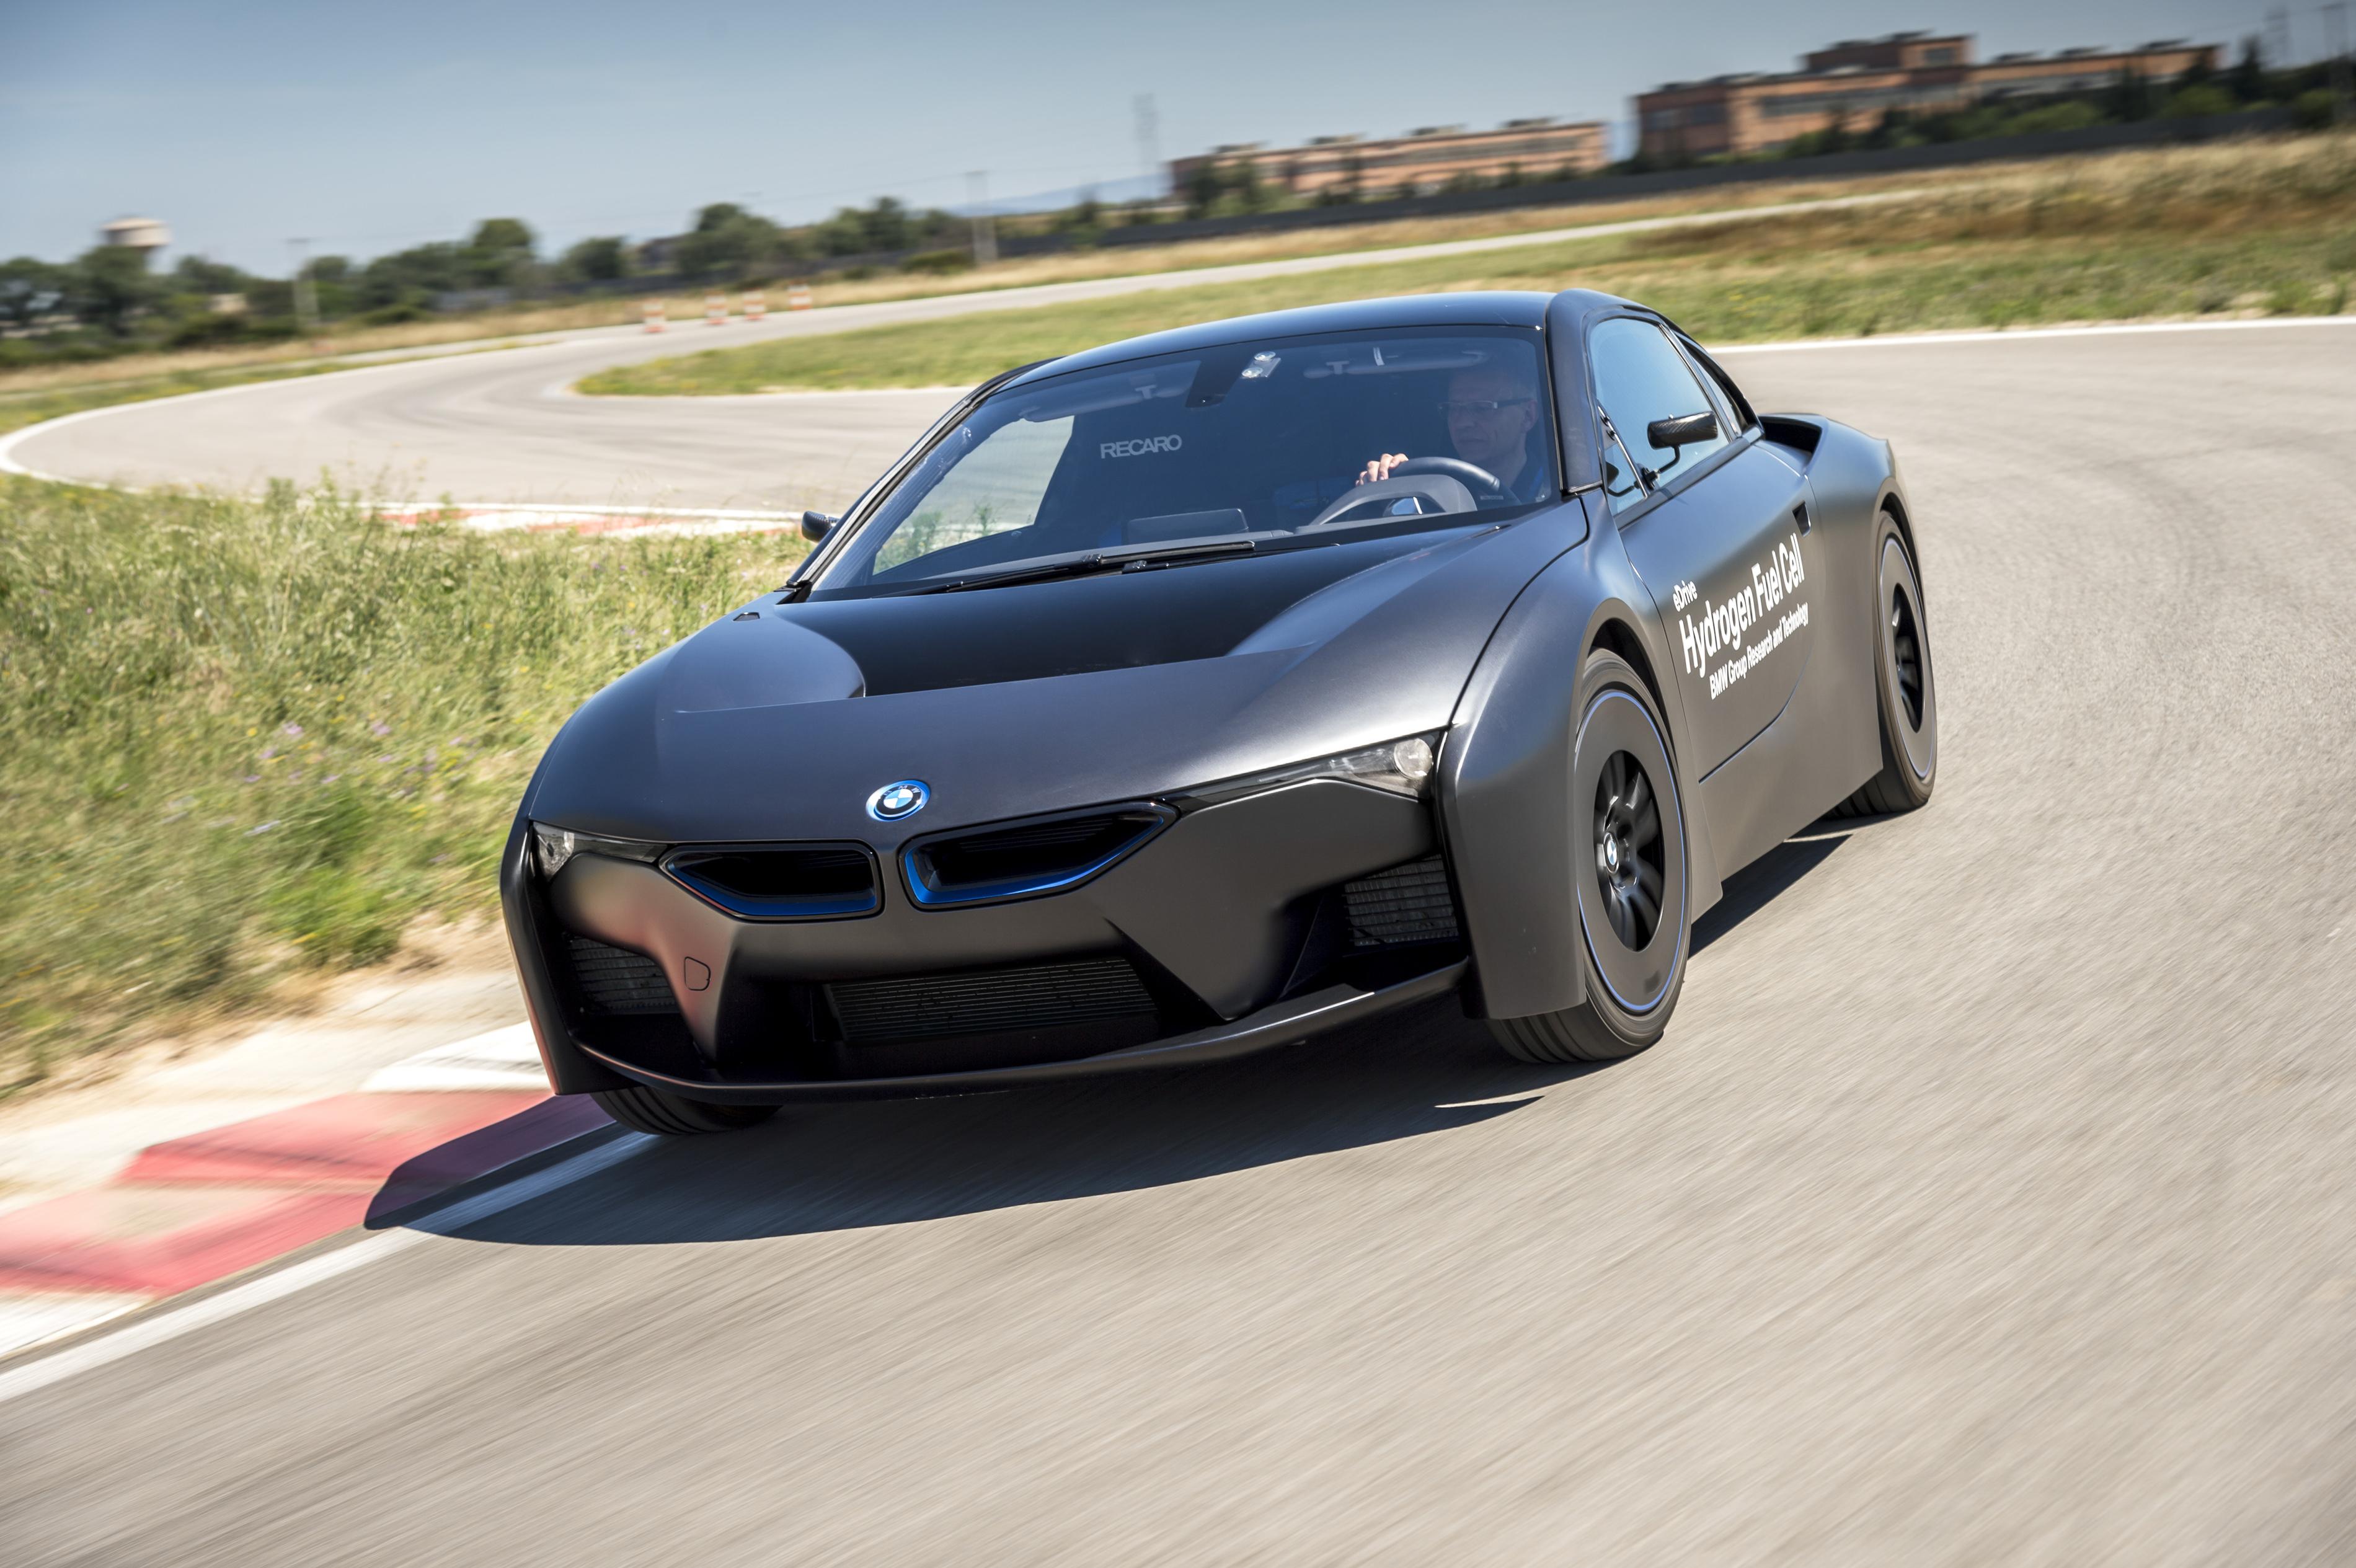 bmw shows off first hydrogen fuel cell cars crazy i8. Black Bedroom Furniture Sets. Home Design Ideas